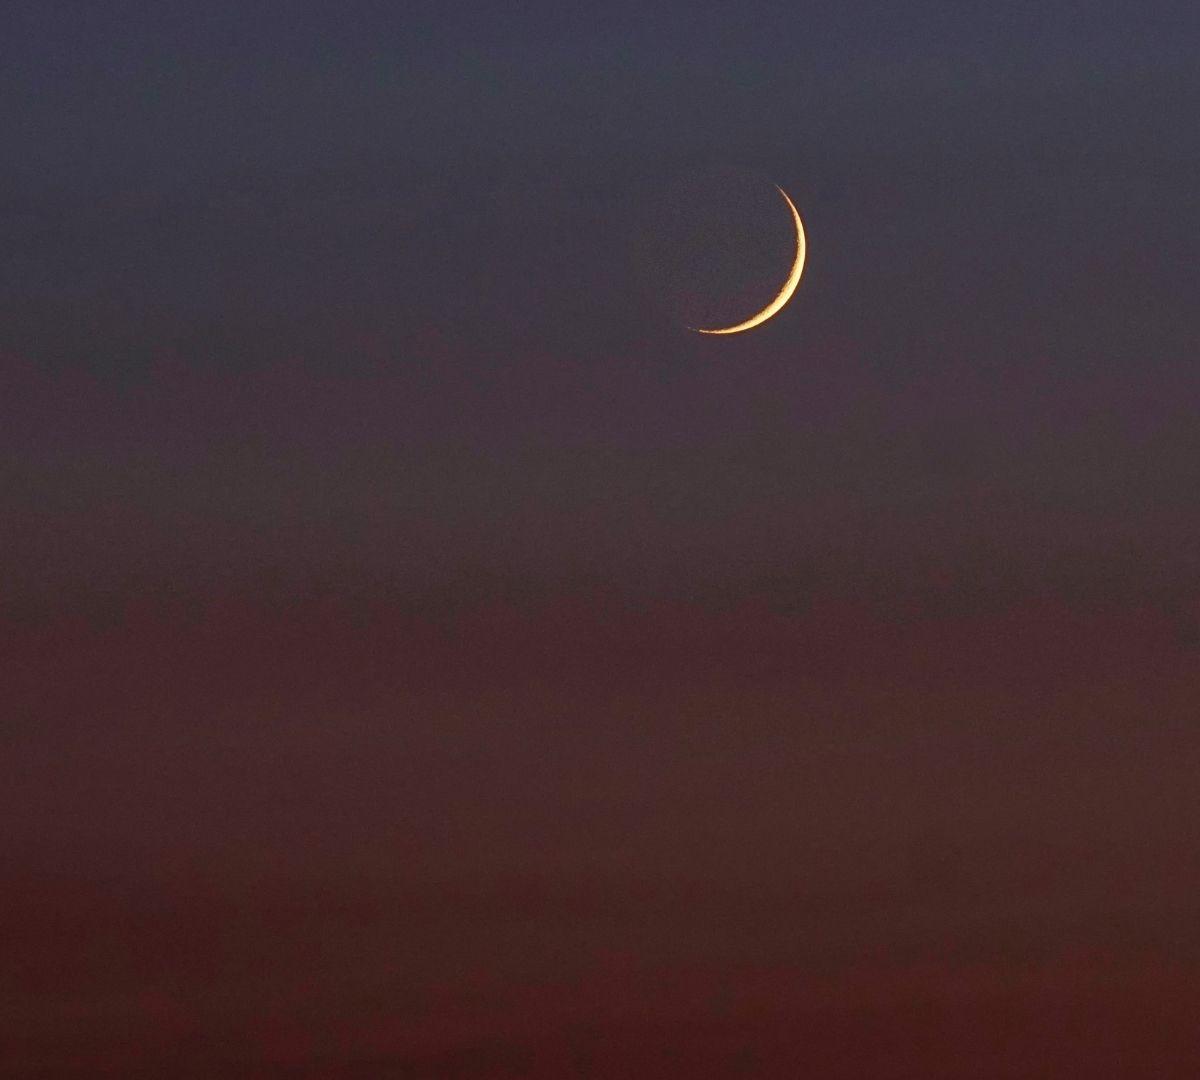 New Moon in a dark sky